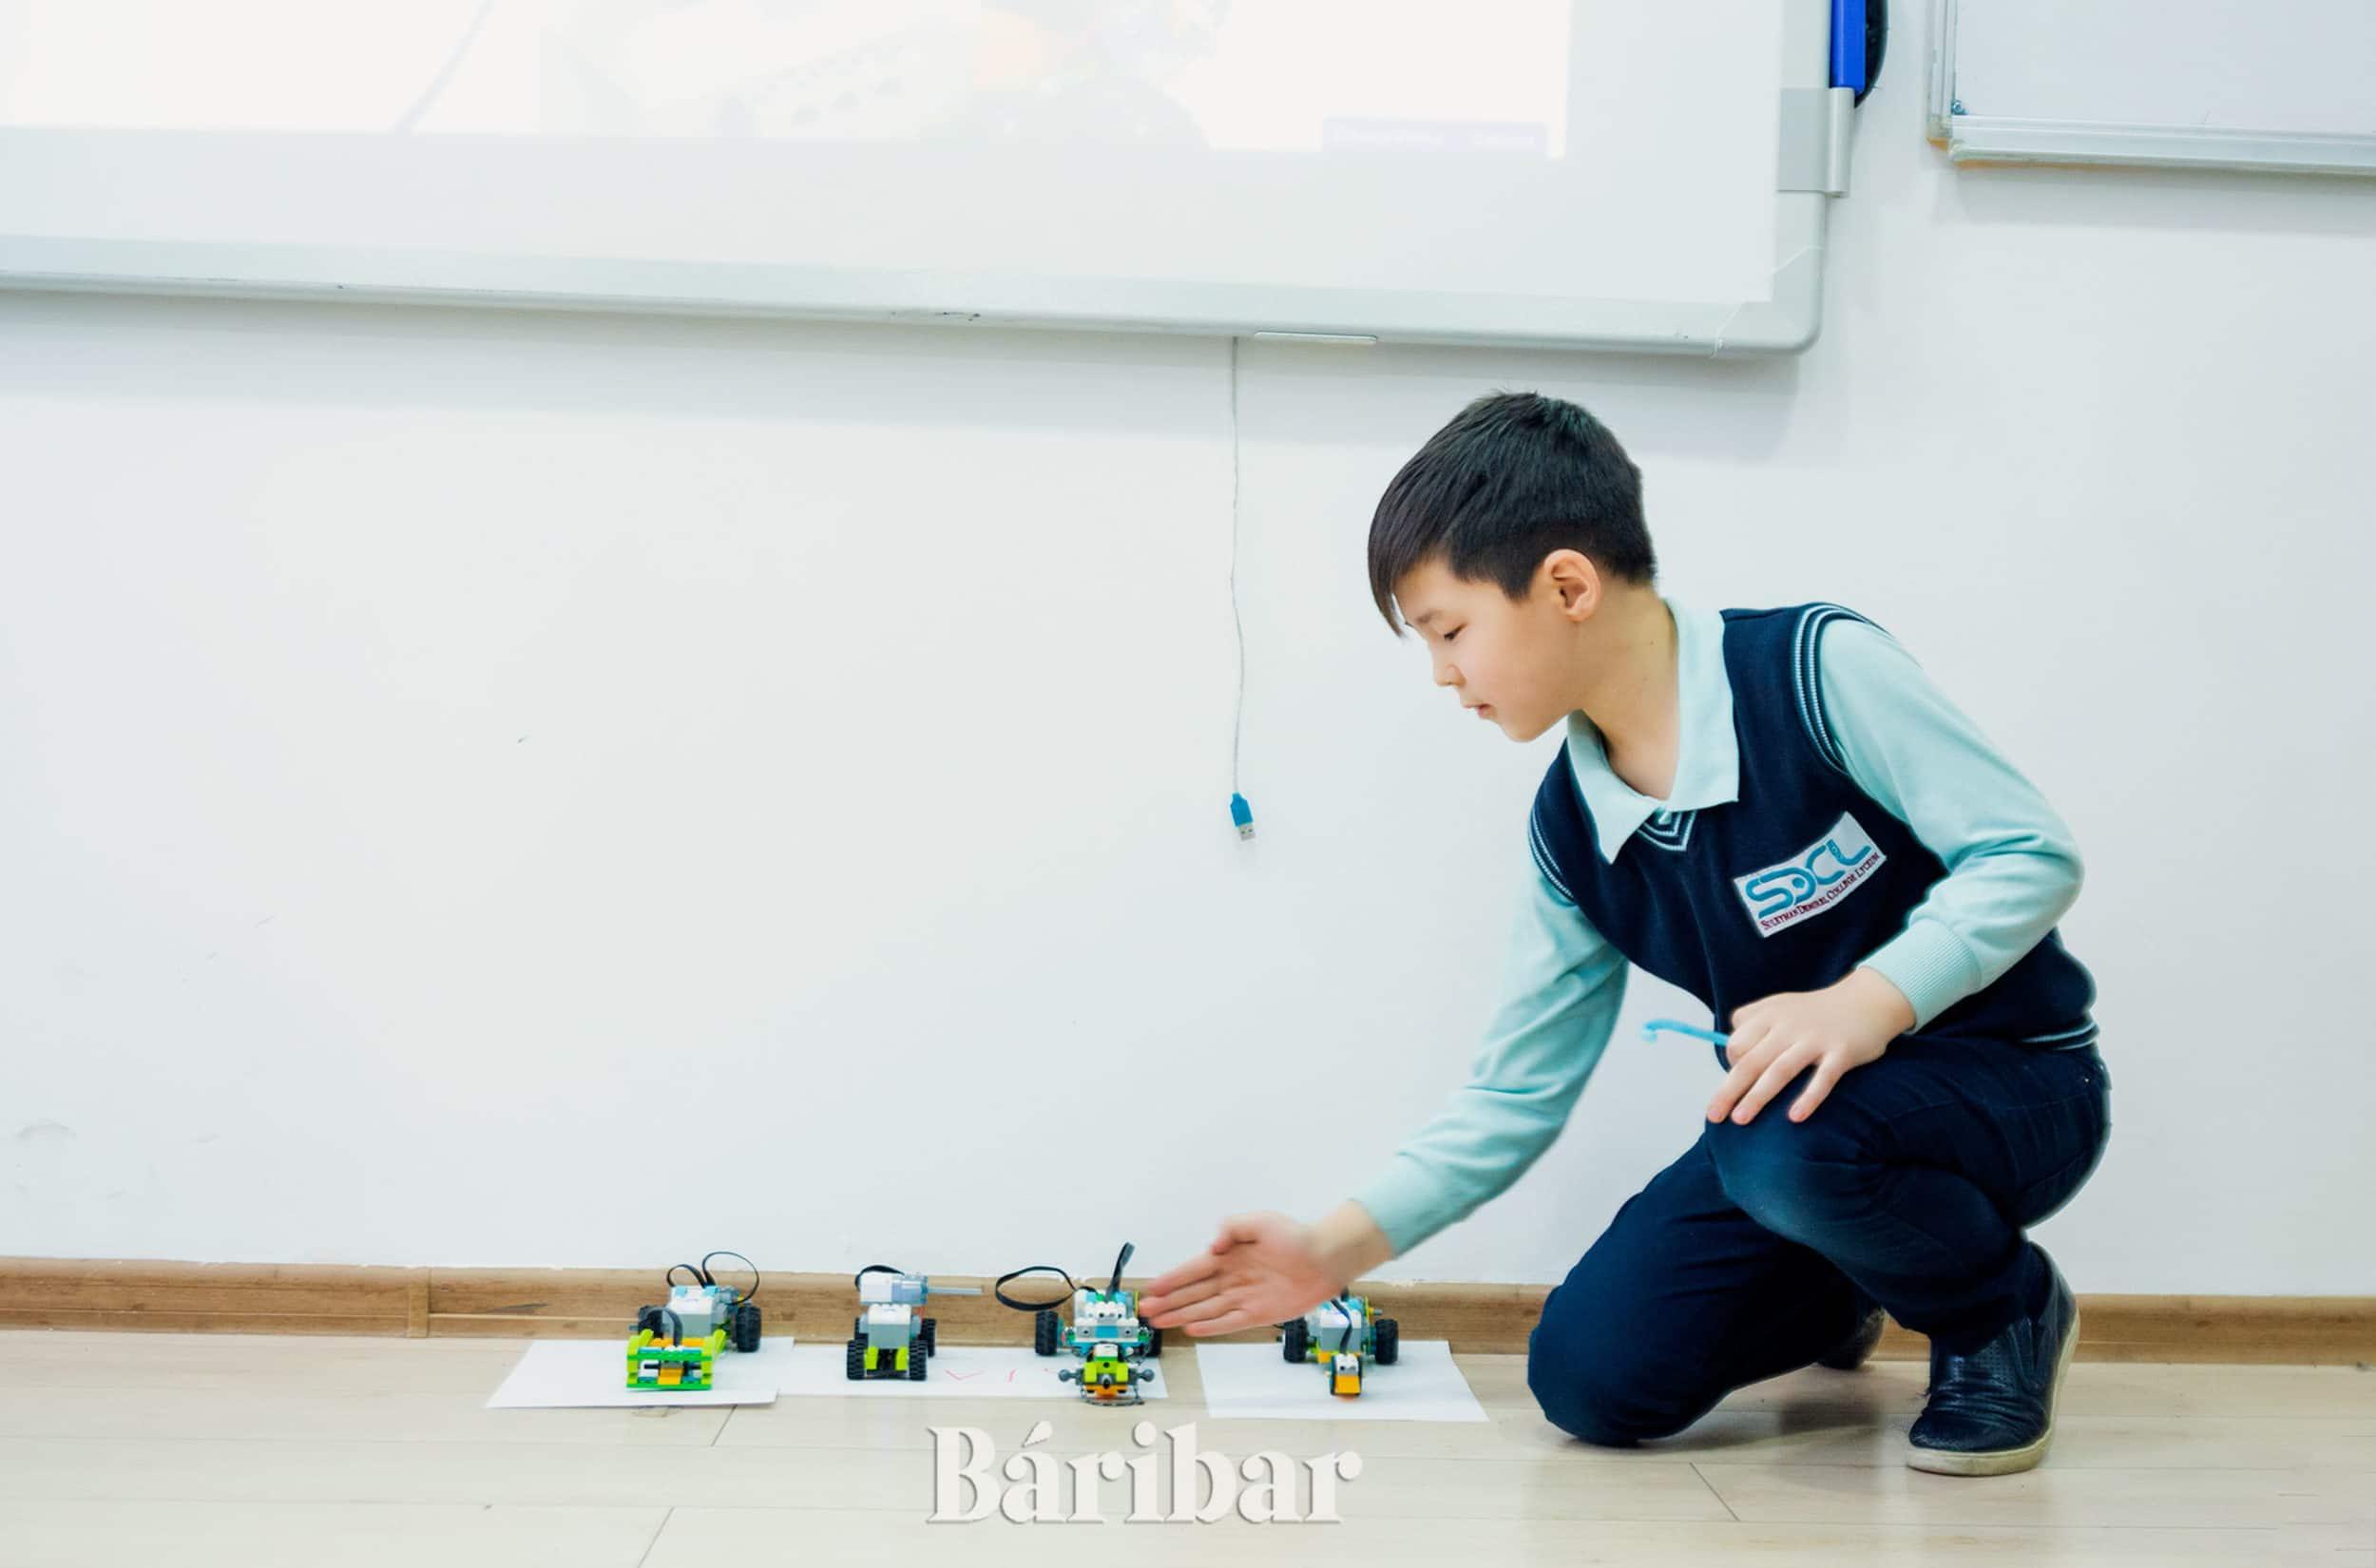 робототехника, оқушы